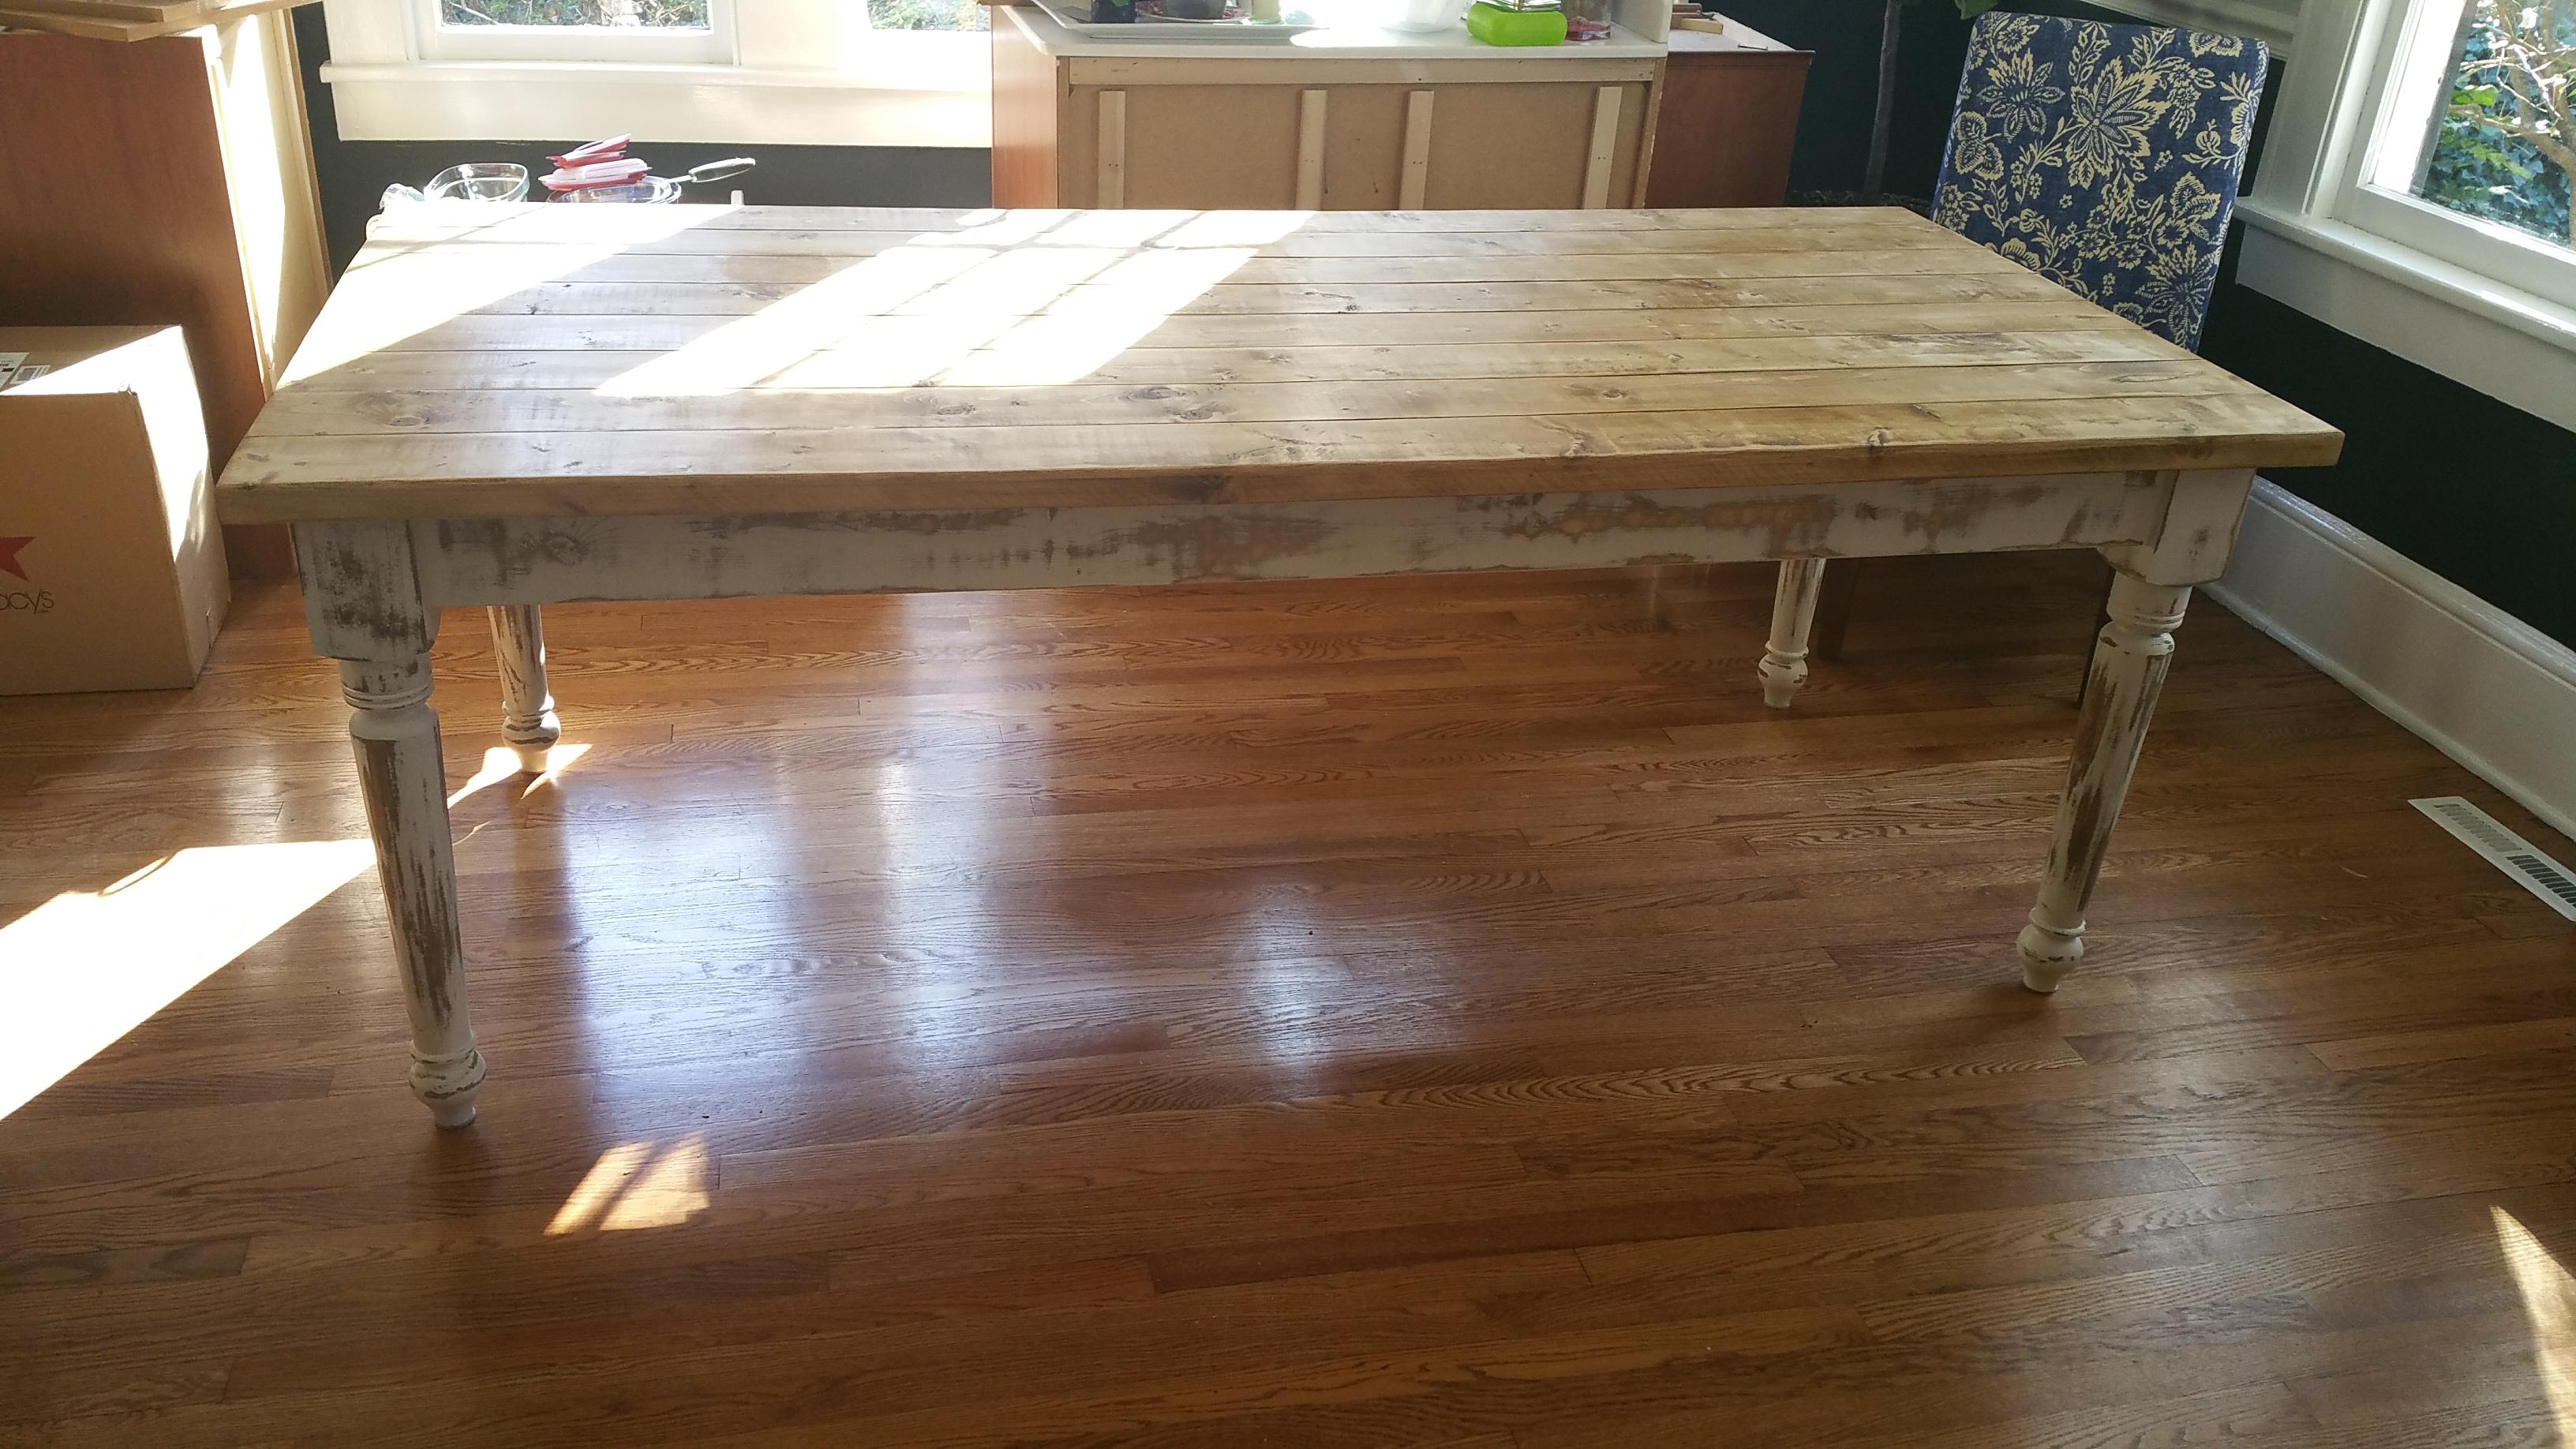 Osborne Wood Products Blog-Custom Table Legs for a Designer